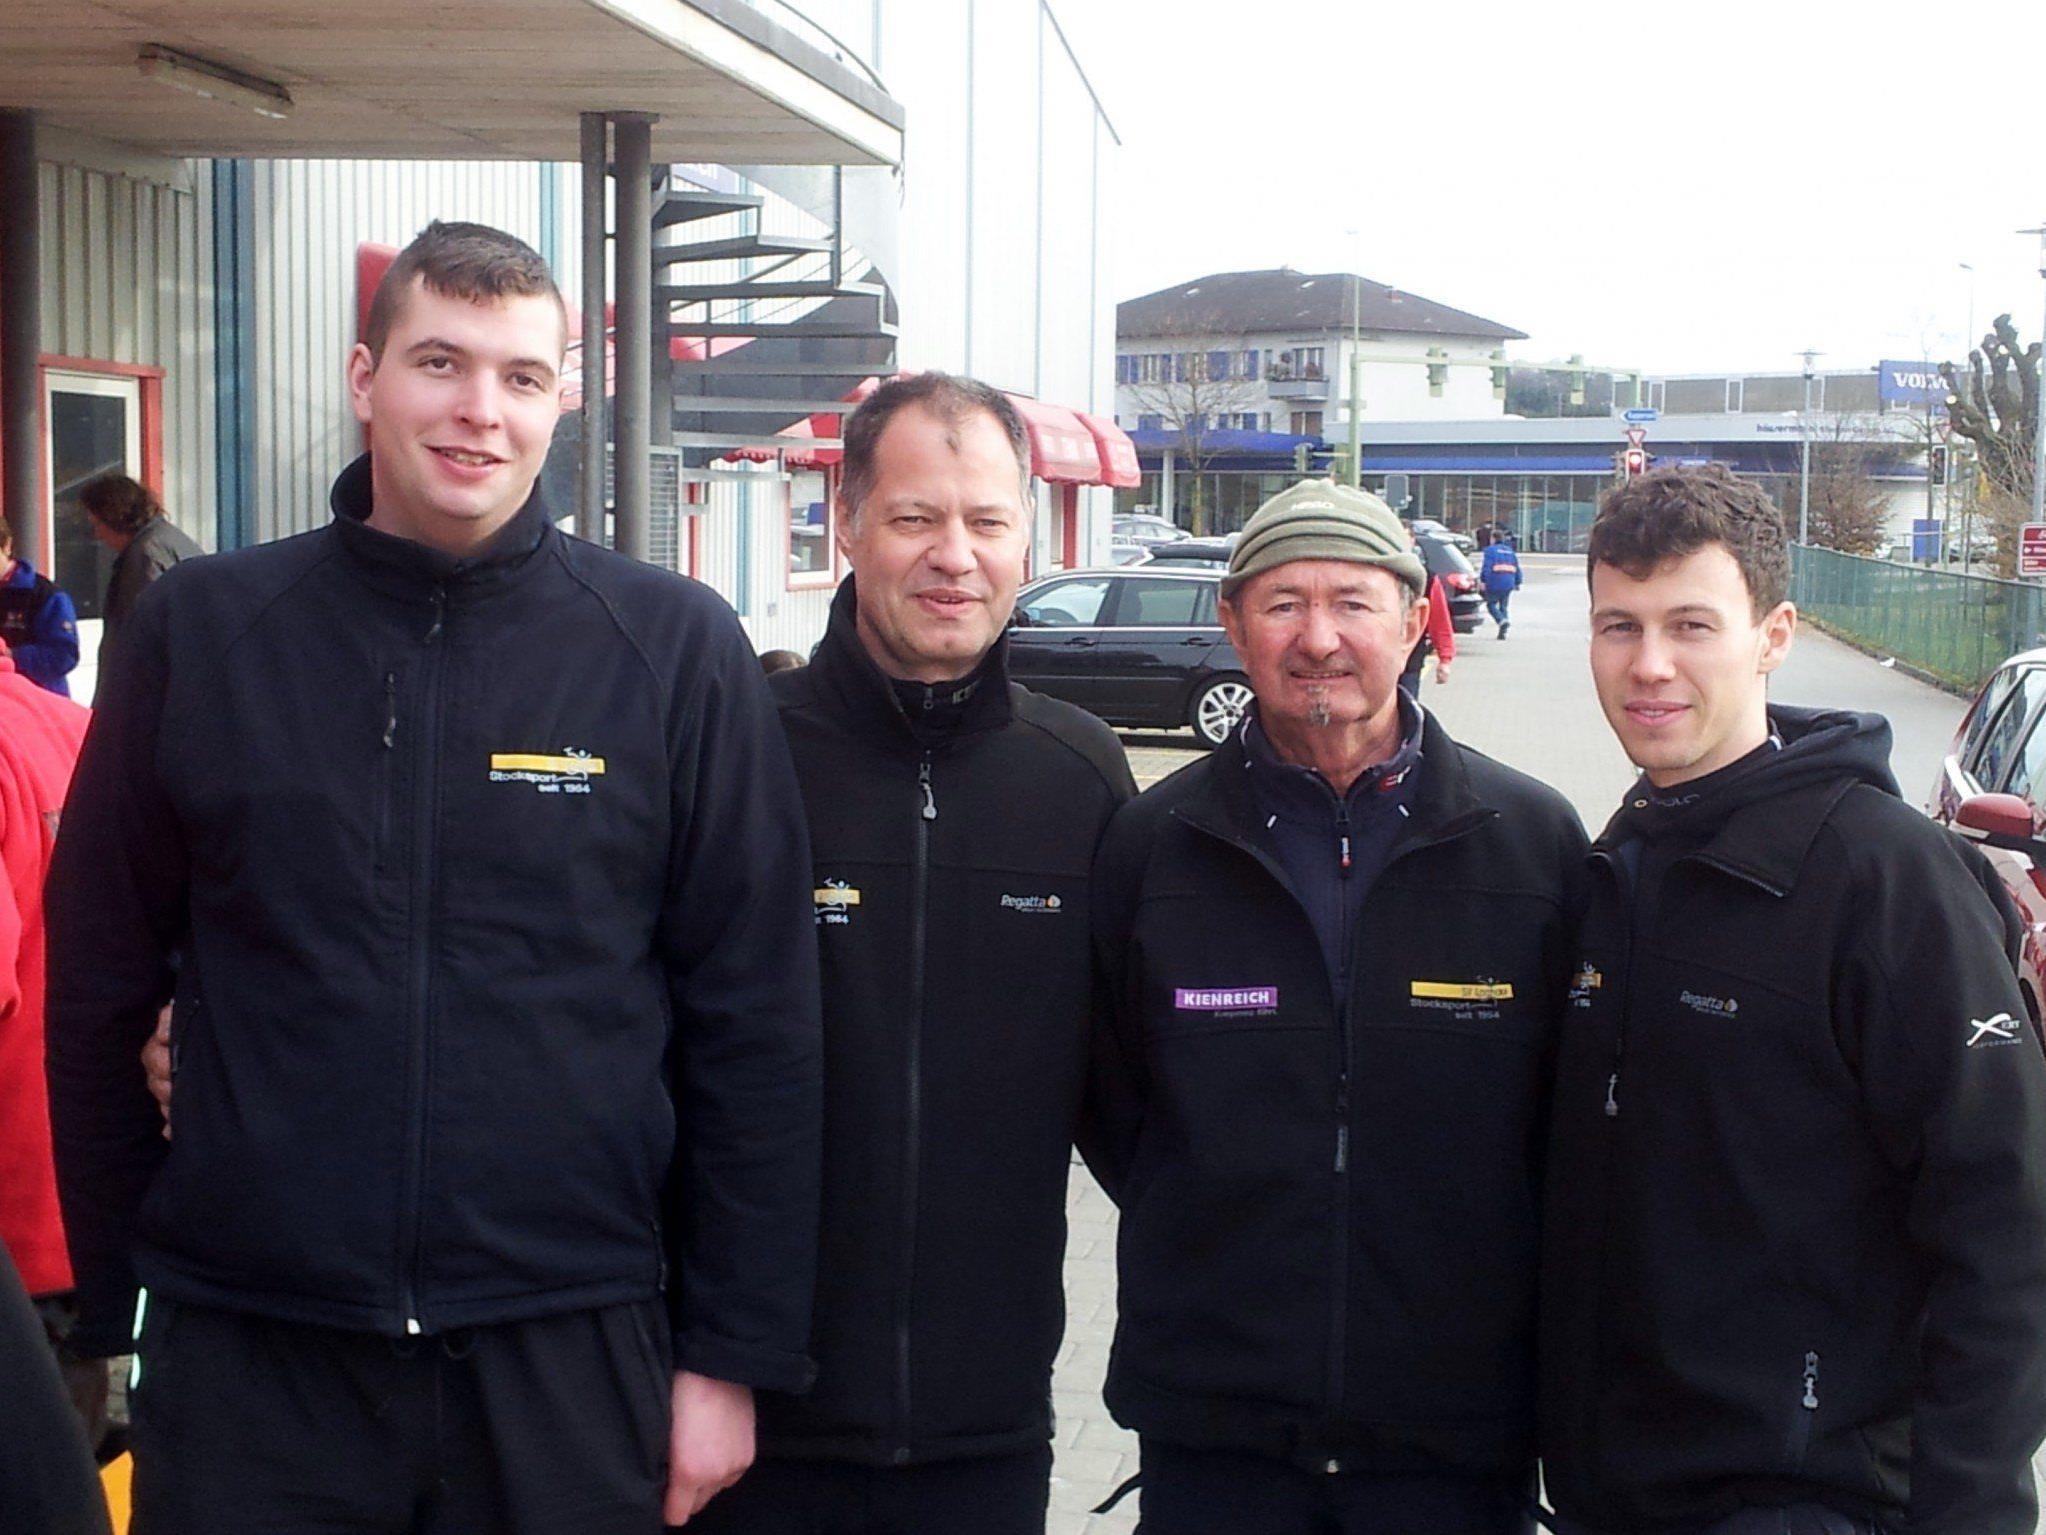 Patrik Plangger, Christoph Sohm, Erich Pienz, Abraham Sohm (v.l.n.r.)